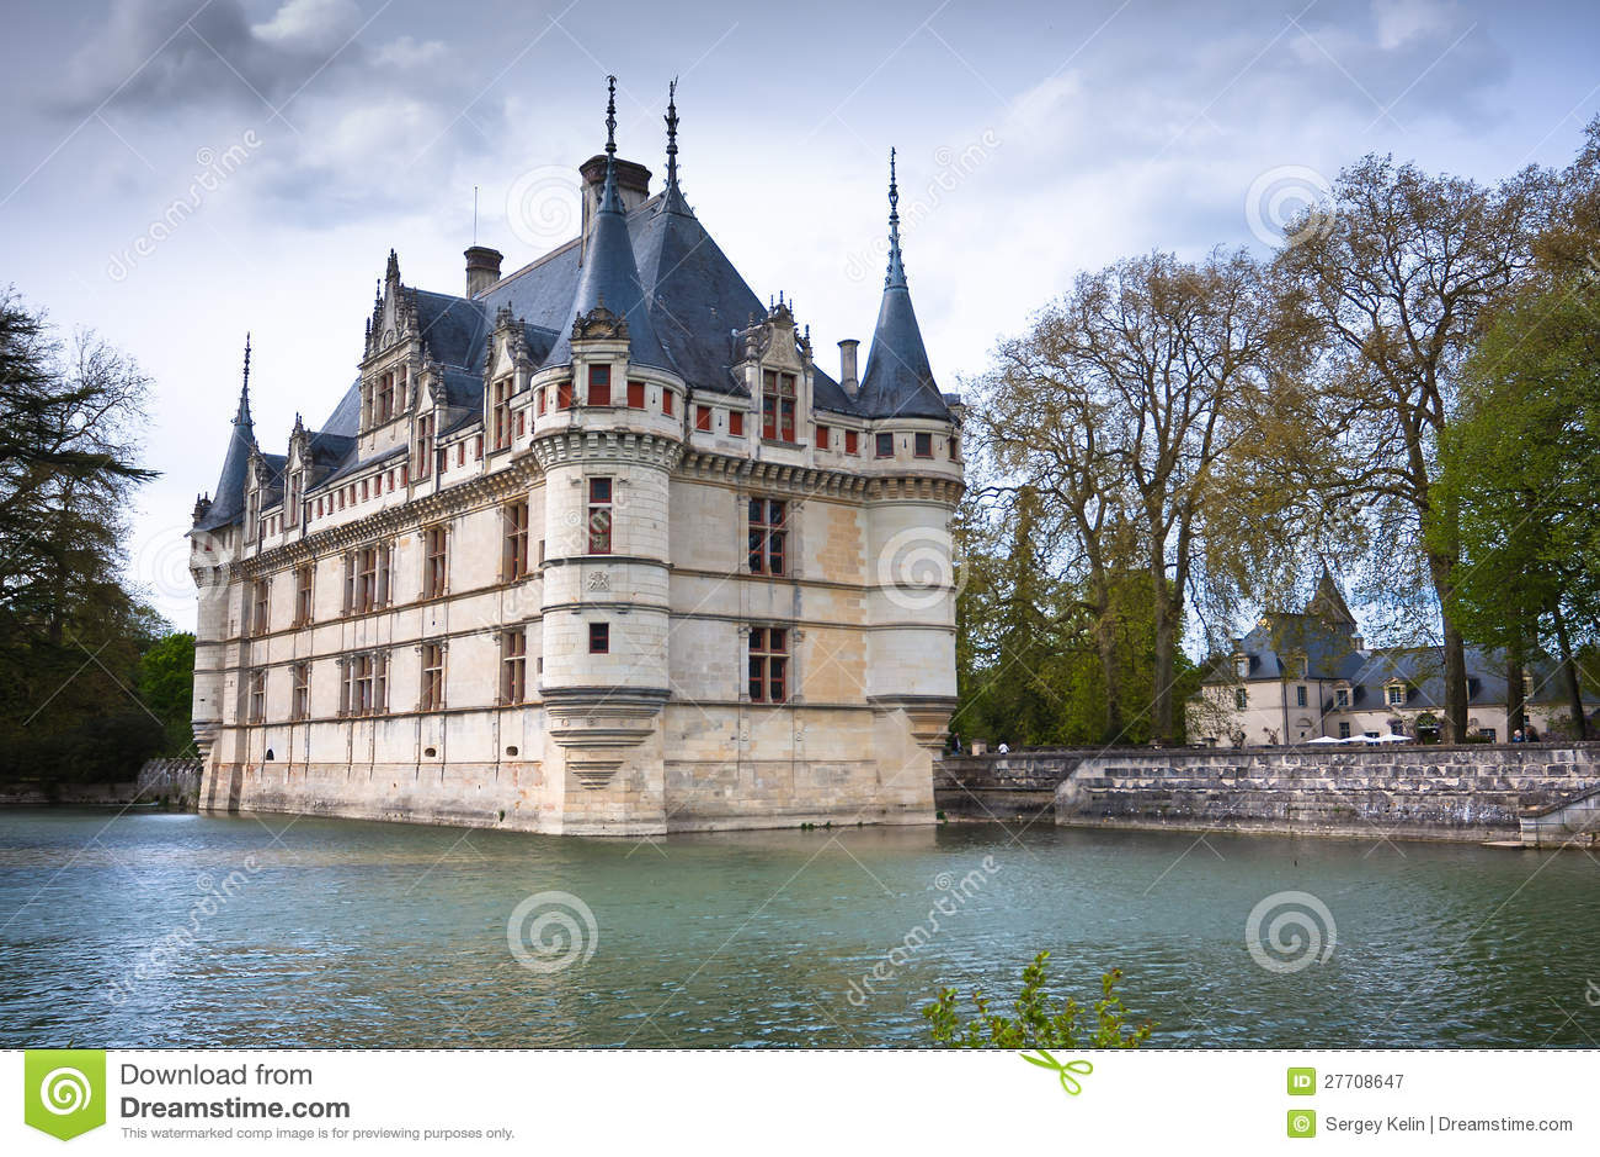 Azay Le Rideau Castle Loire Valley France Stock Image